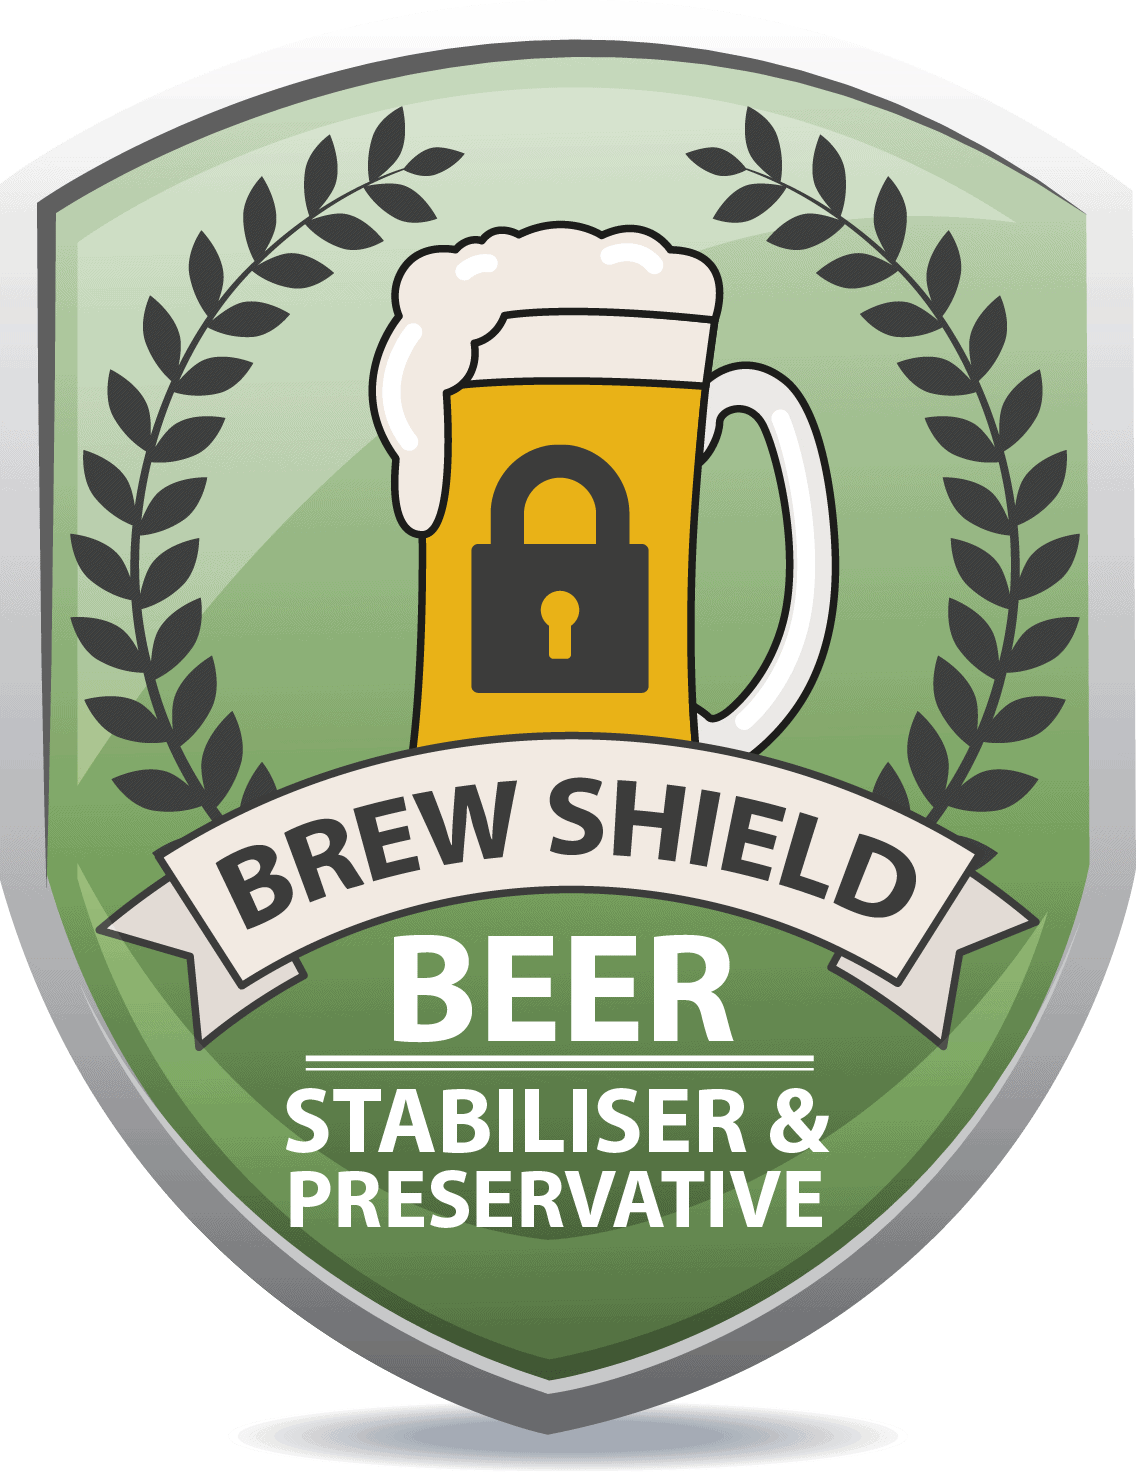 Brewshield Beer Preservative Stoak Technologies